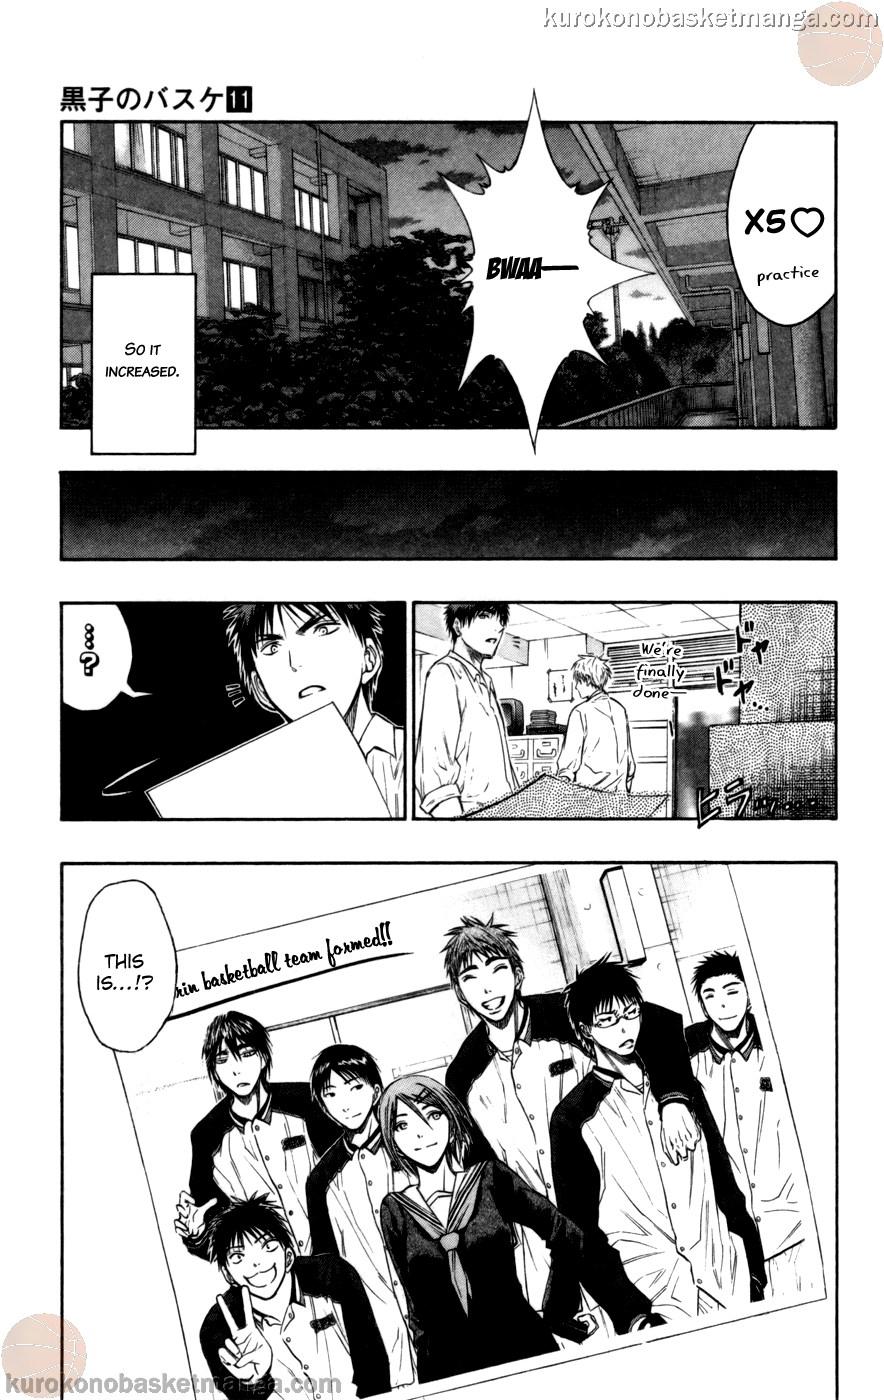 Kuroko no Basket Manga Chapter 94 - Image 19